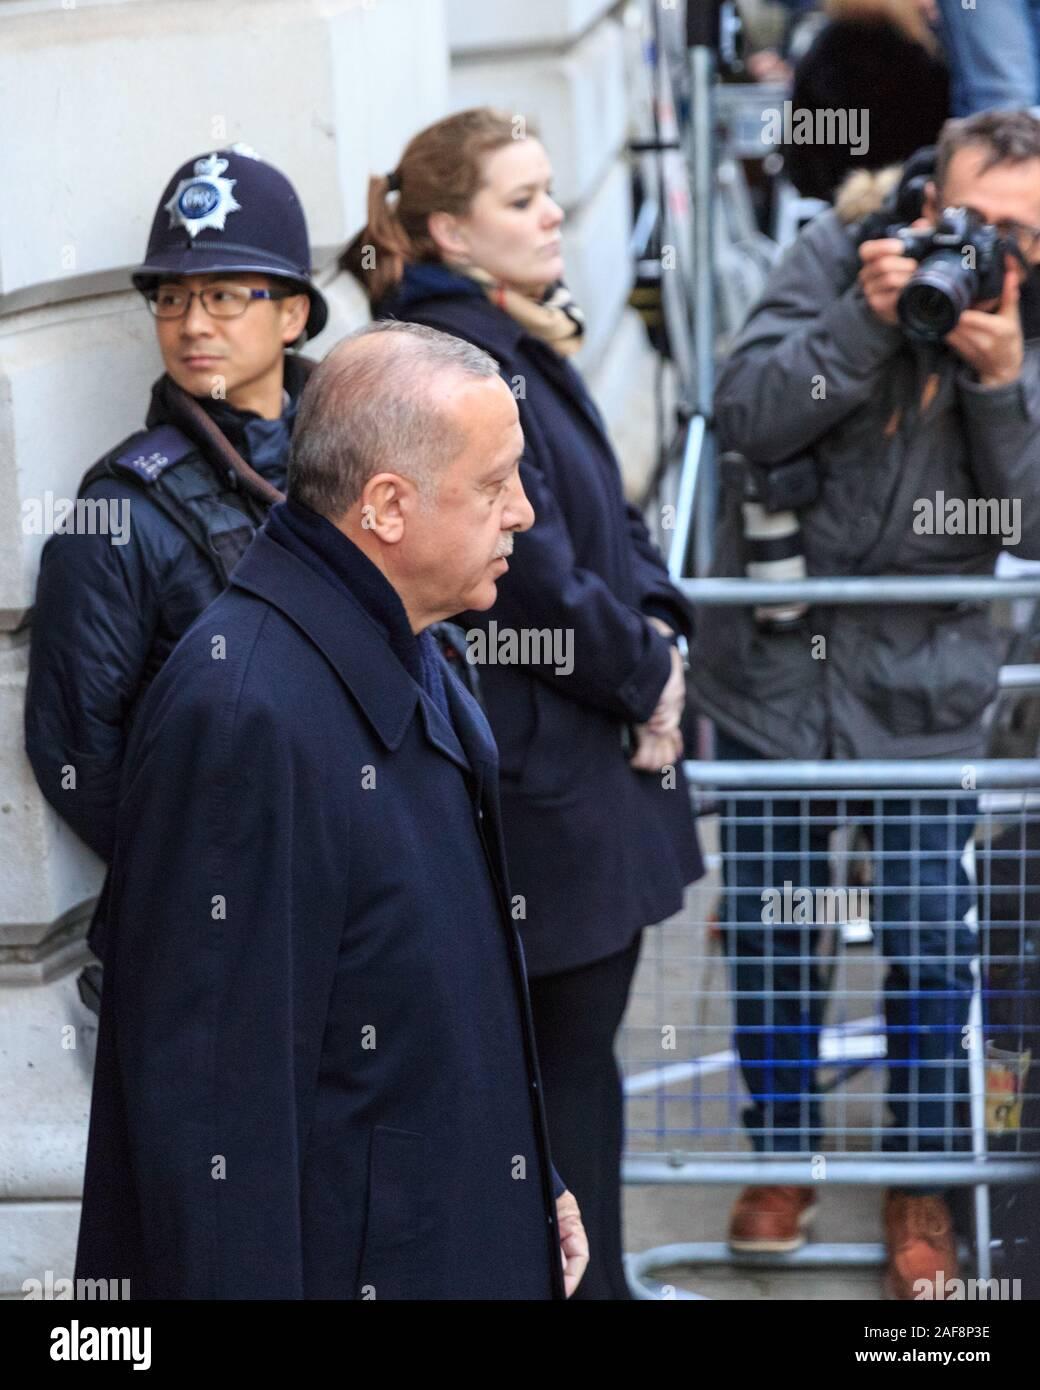 Recep Tayyip Erdoğan, President of Turkey, Turkish PM and politician walks past press on a visit in n Downing Street, London, UK, December 2019 Stock Photo